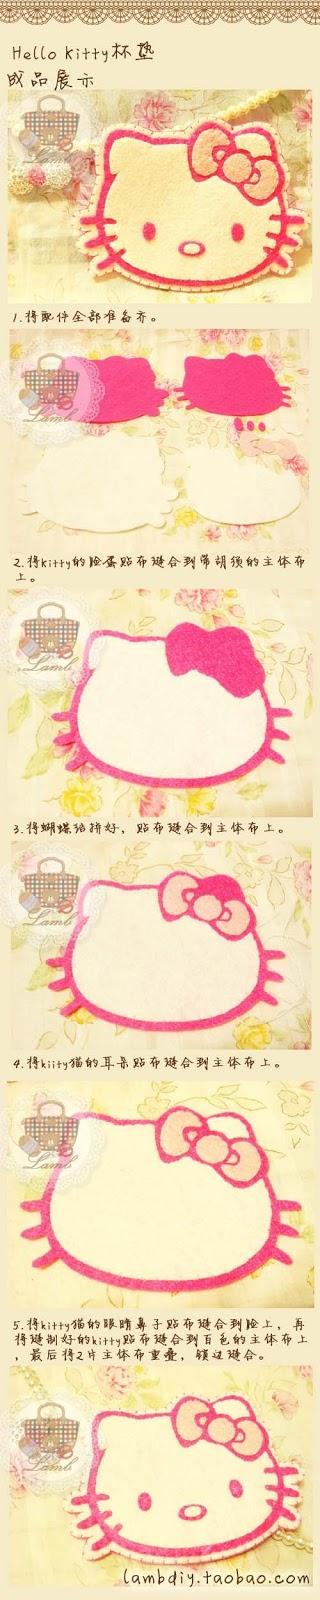 Hello Kitty em feltro passo a passo e moldes